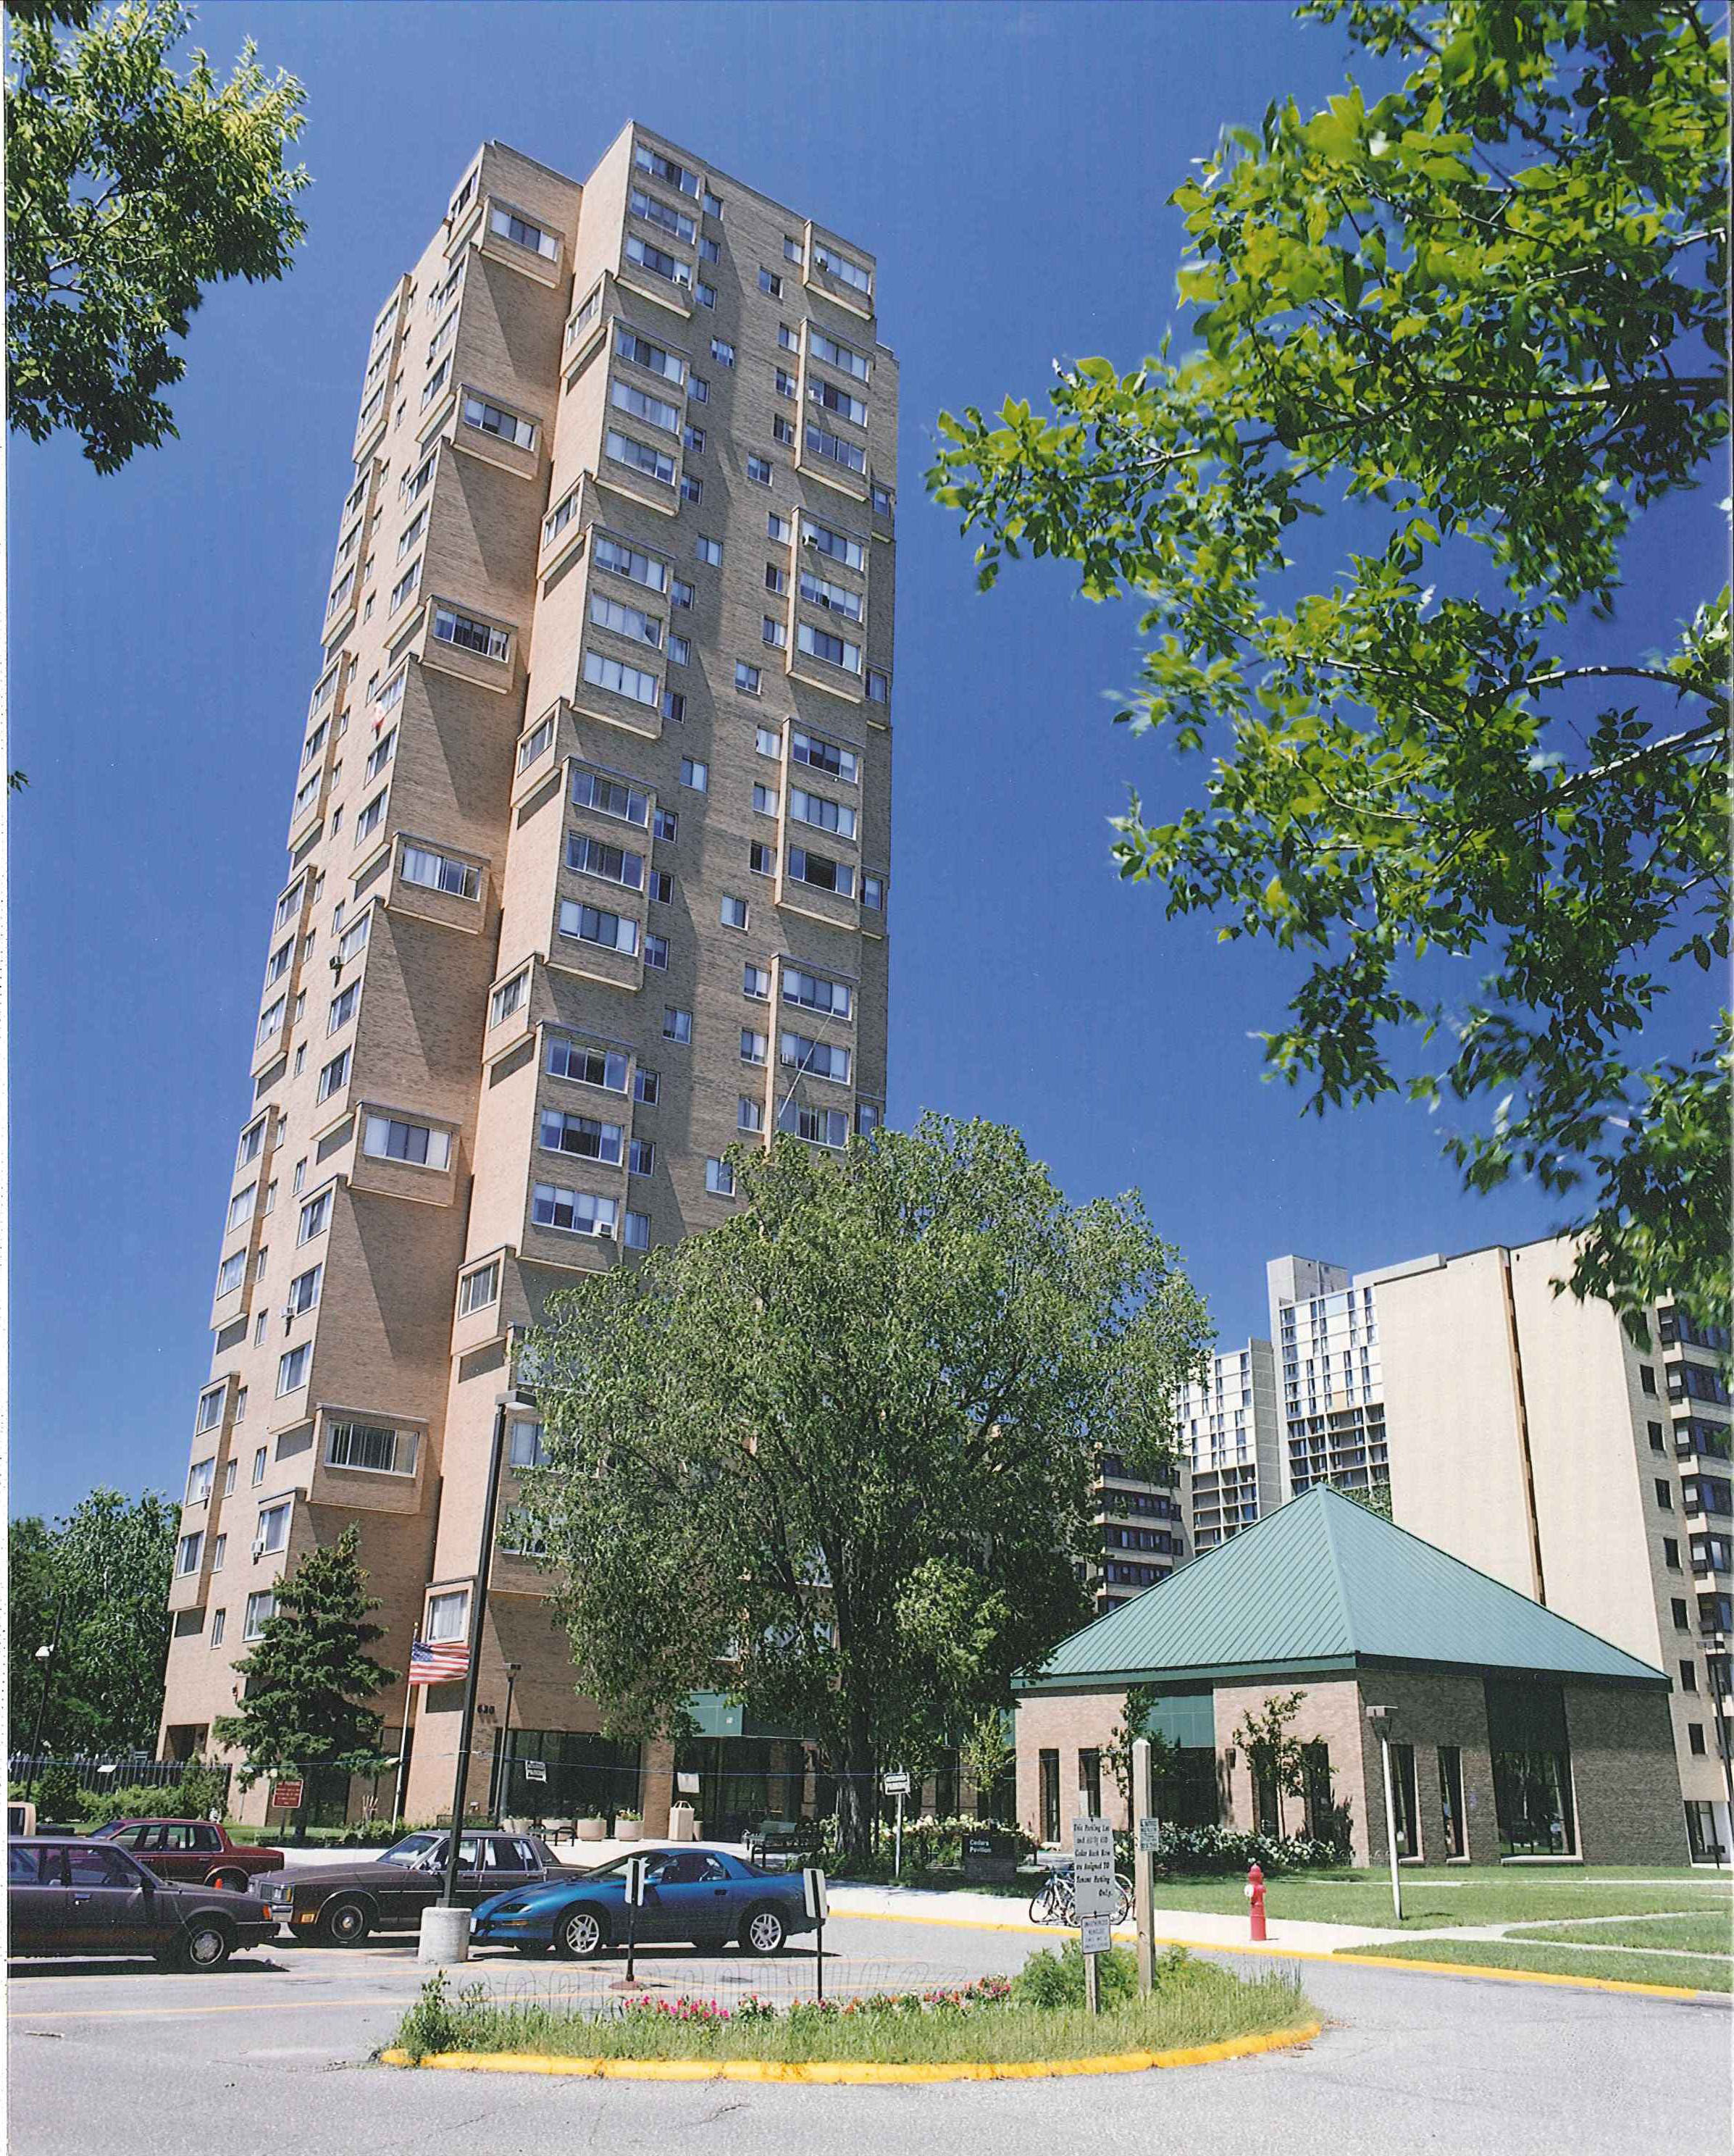 Minneapolis Public Housing